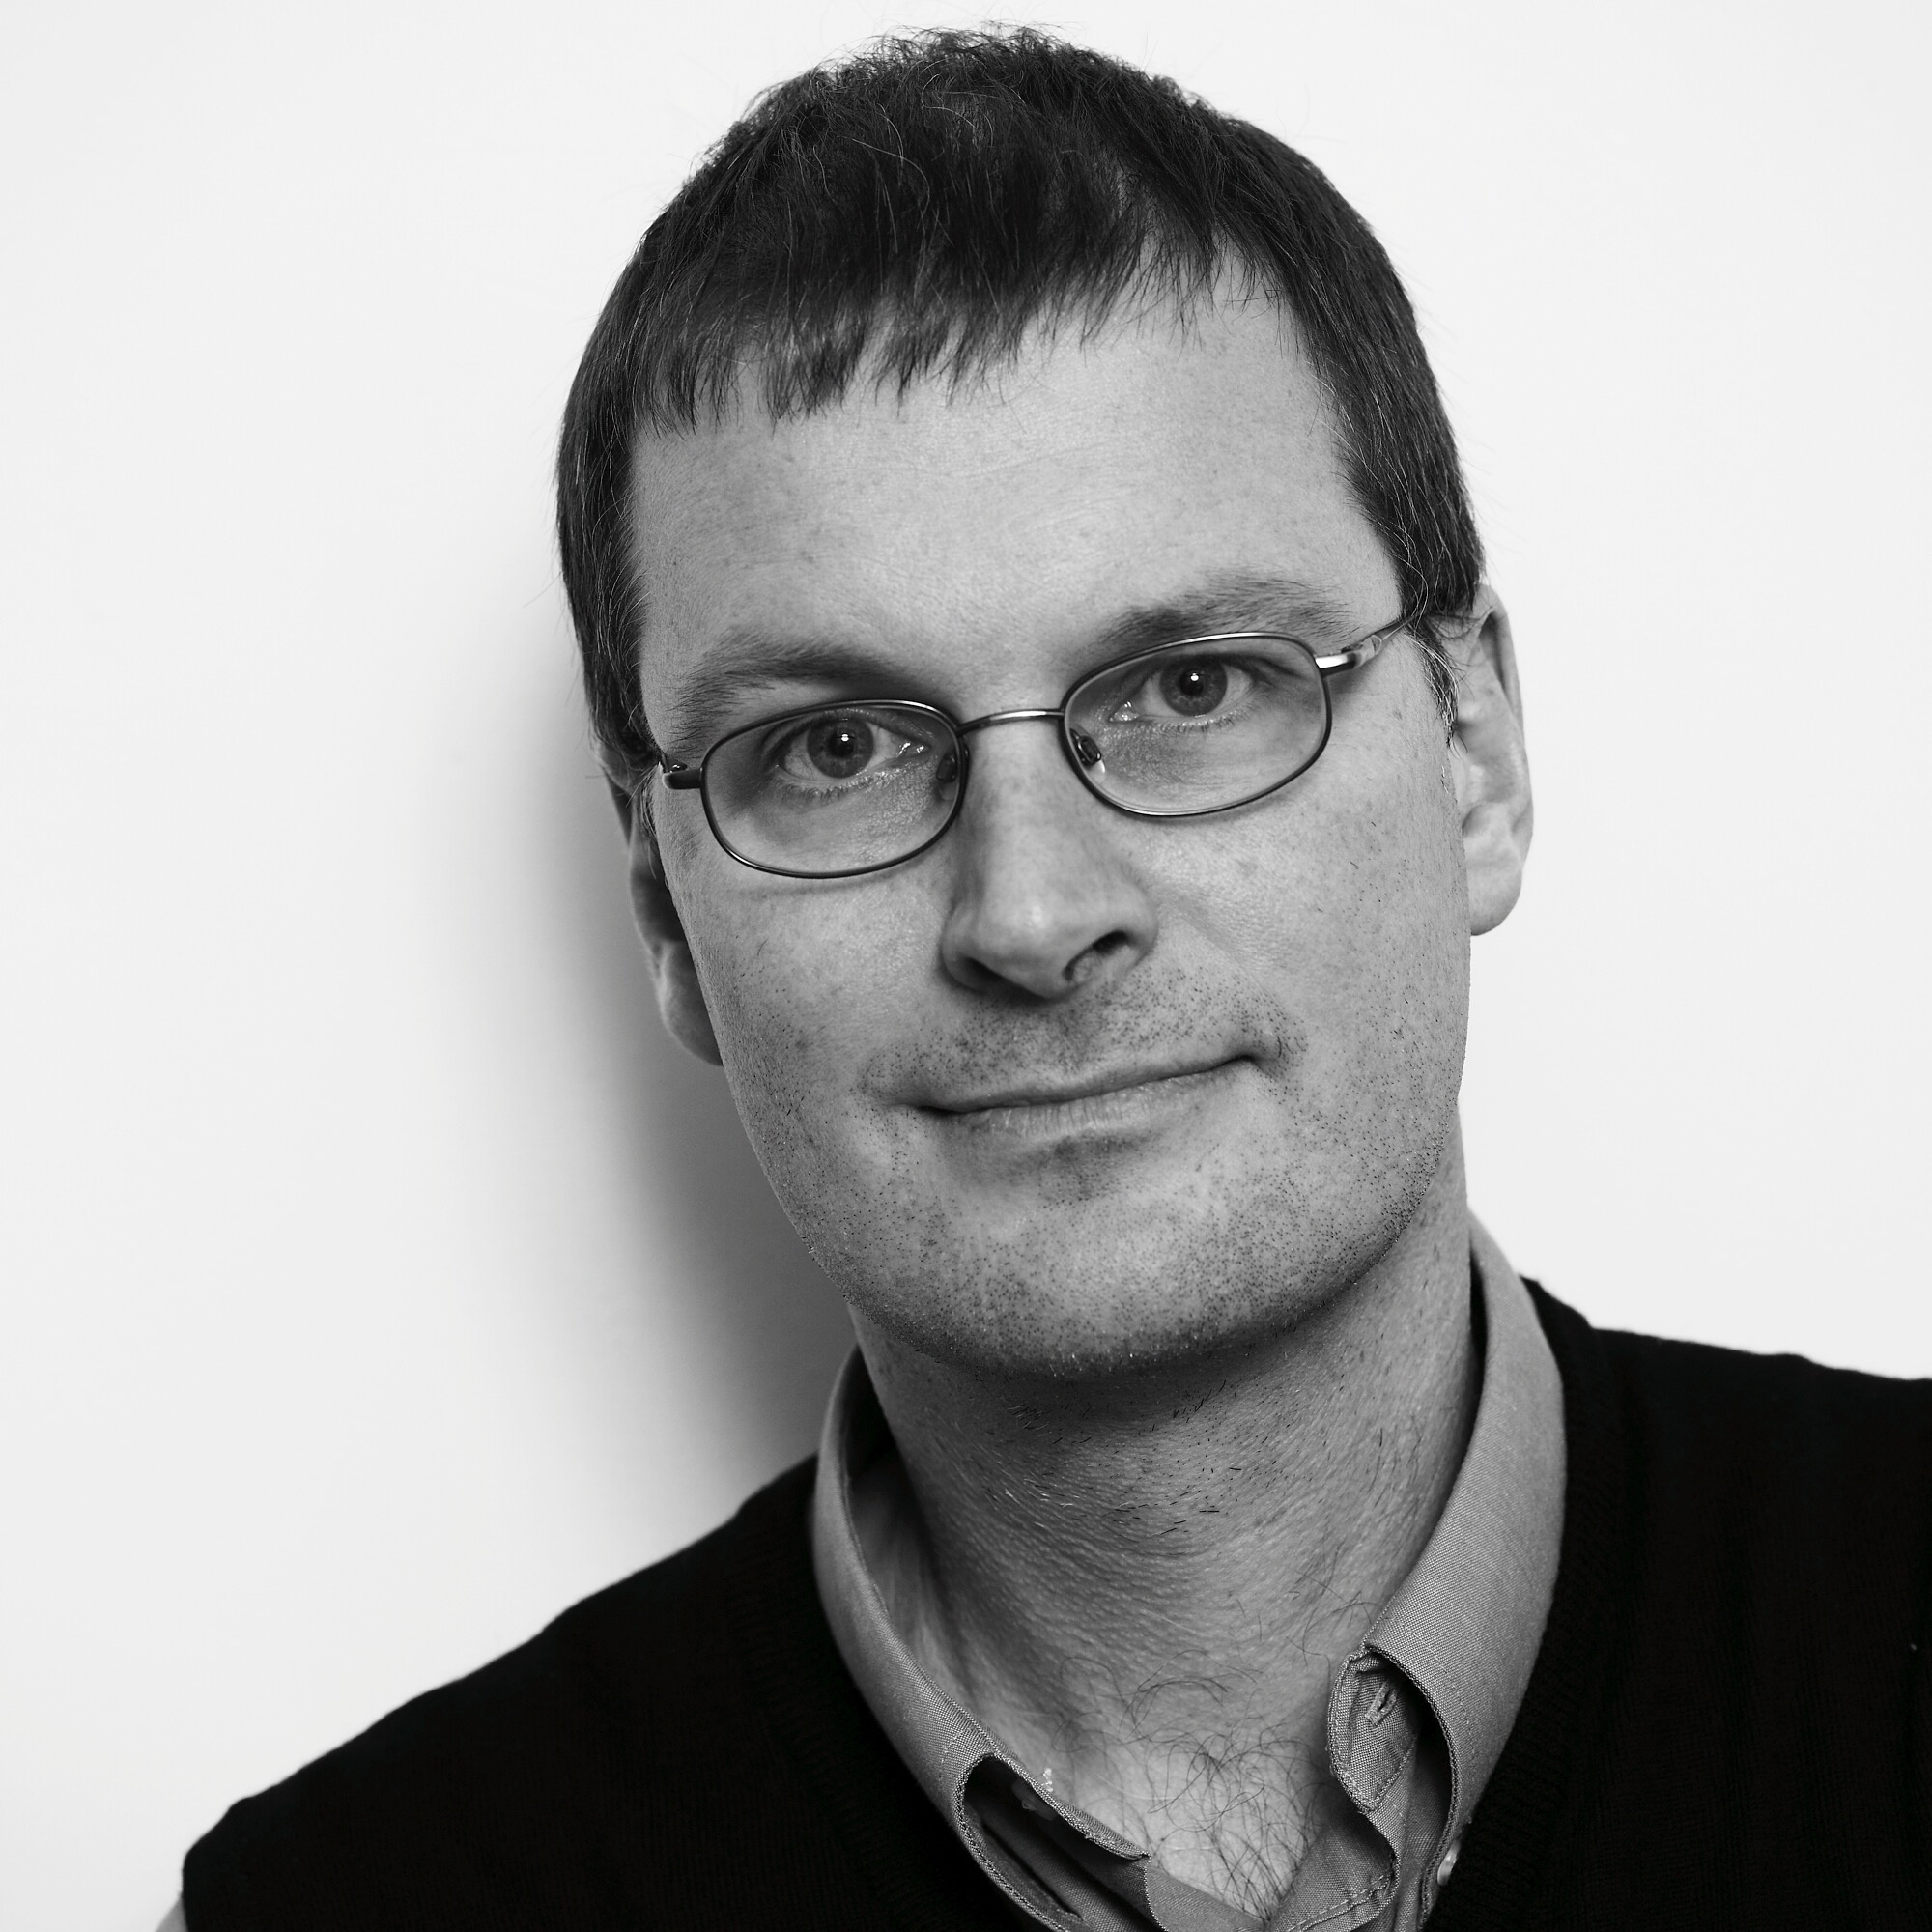 Michael Wooldridge